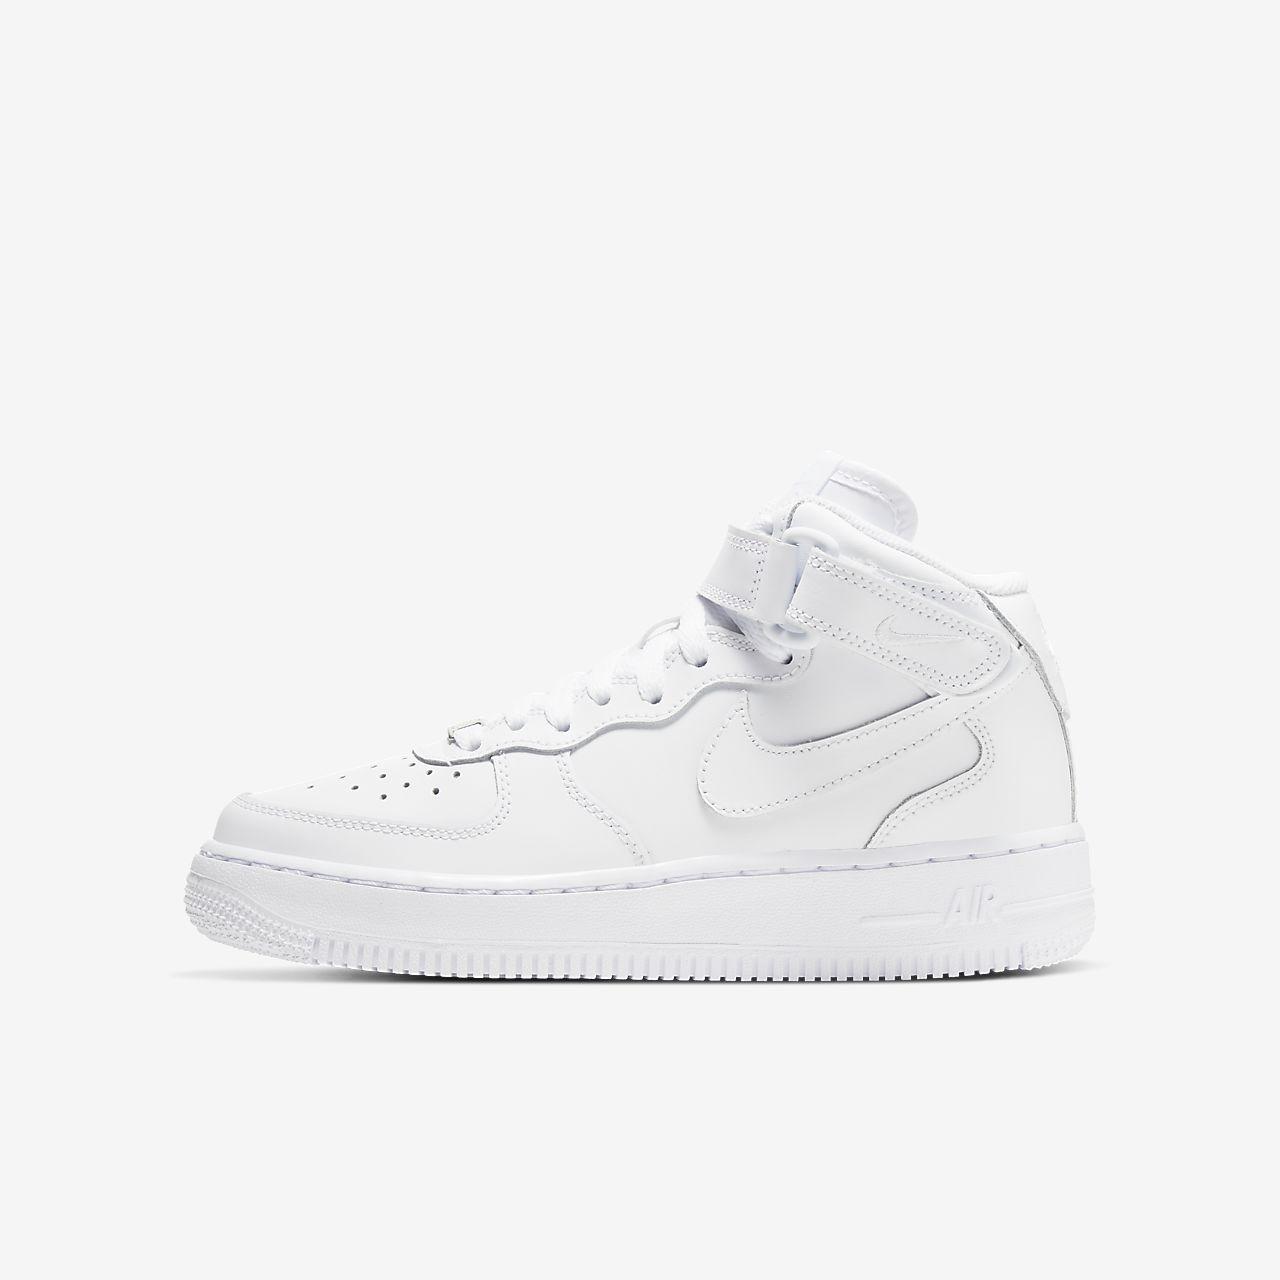 Calzado para niños talla grande Nike Air Force 1 Mid 06